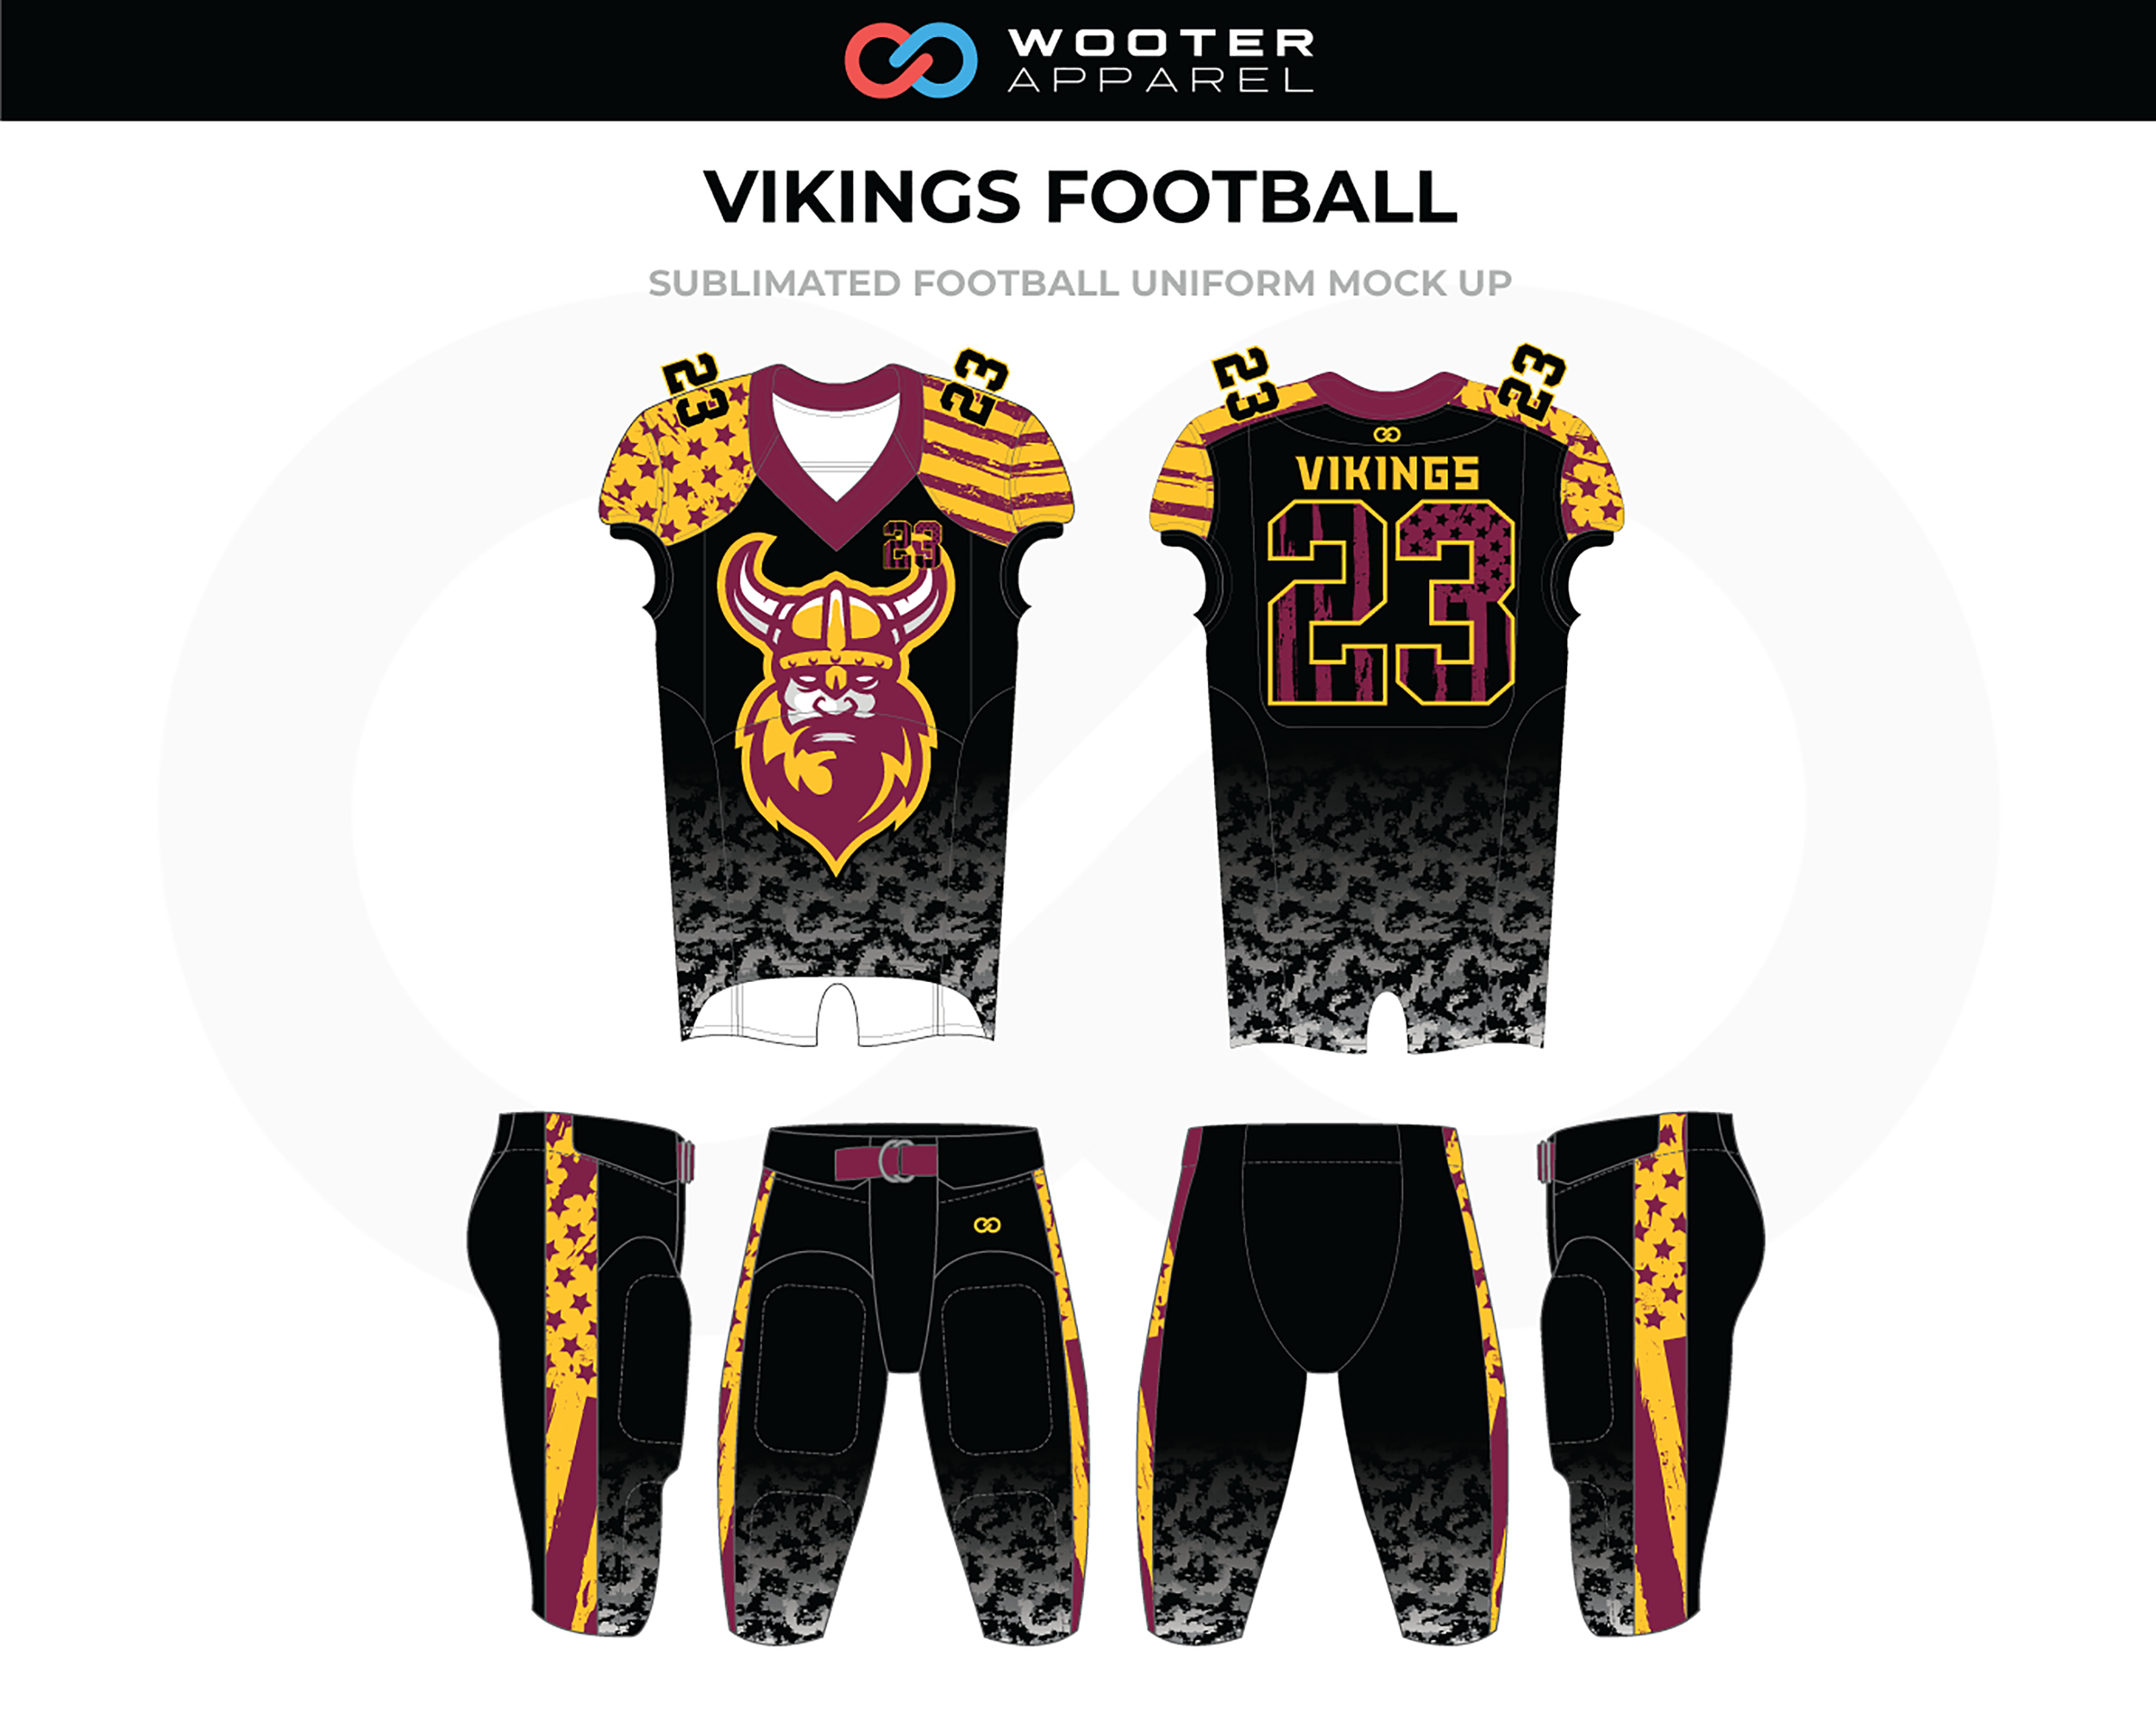 info for a228c cc6e8 Football Designs — Wooter Apparel | Team Uniforms and Custom ...